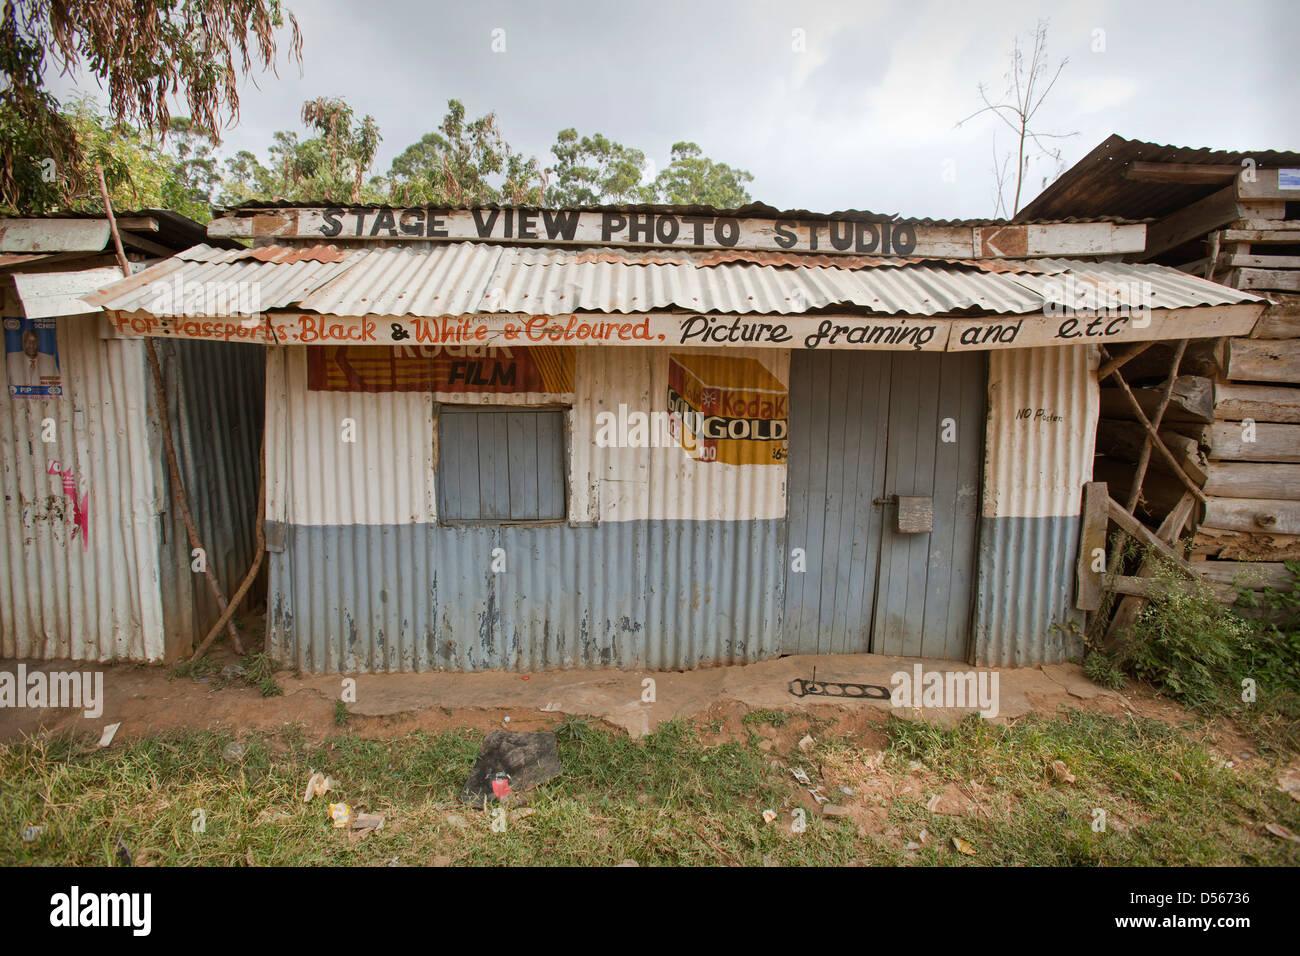 The 'Stage View Photo Studio' Photo Kiosk, Yala province, Kenya. - Stock Image